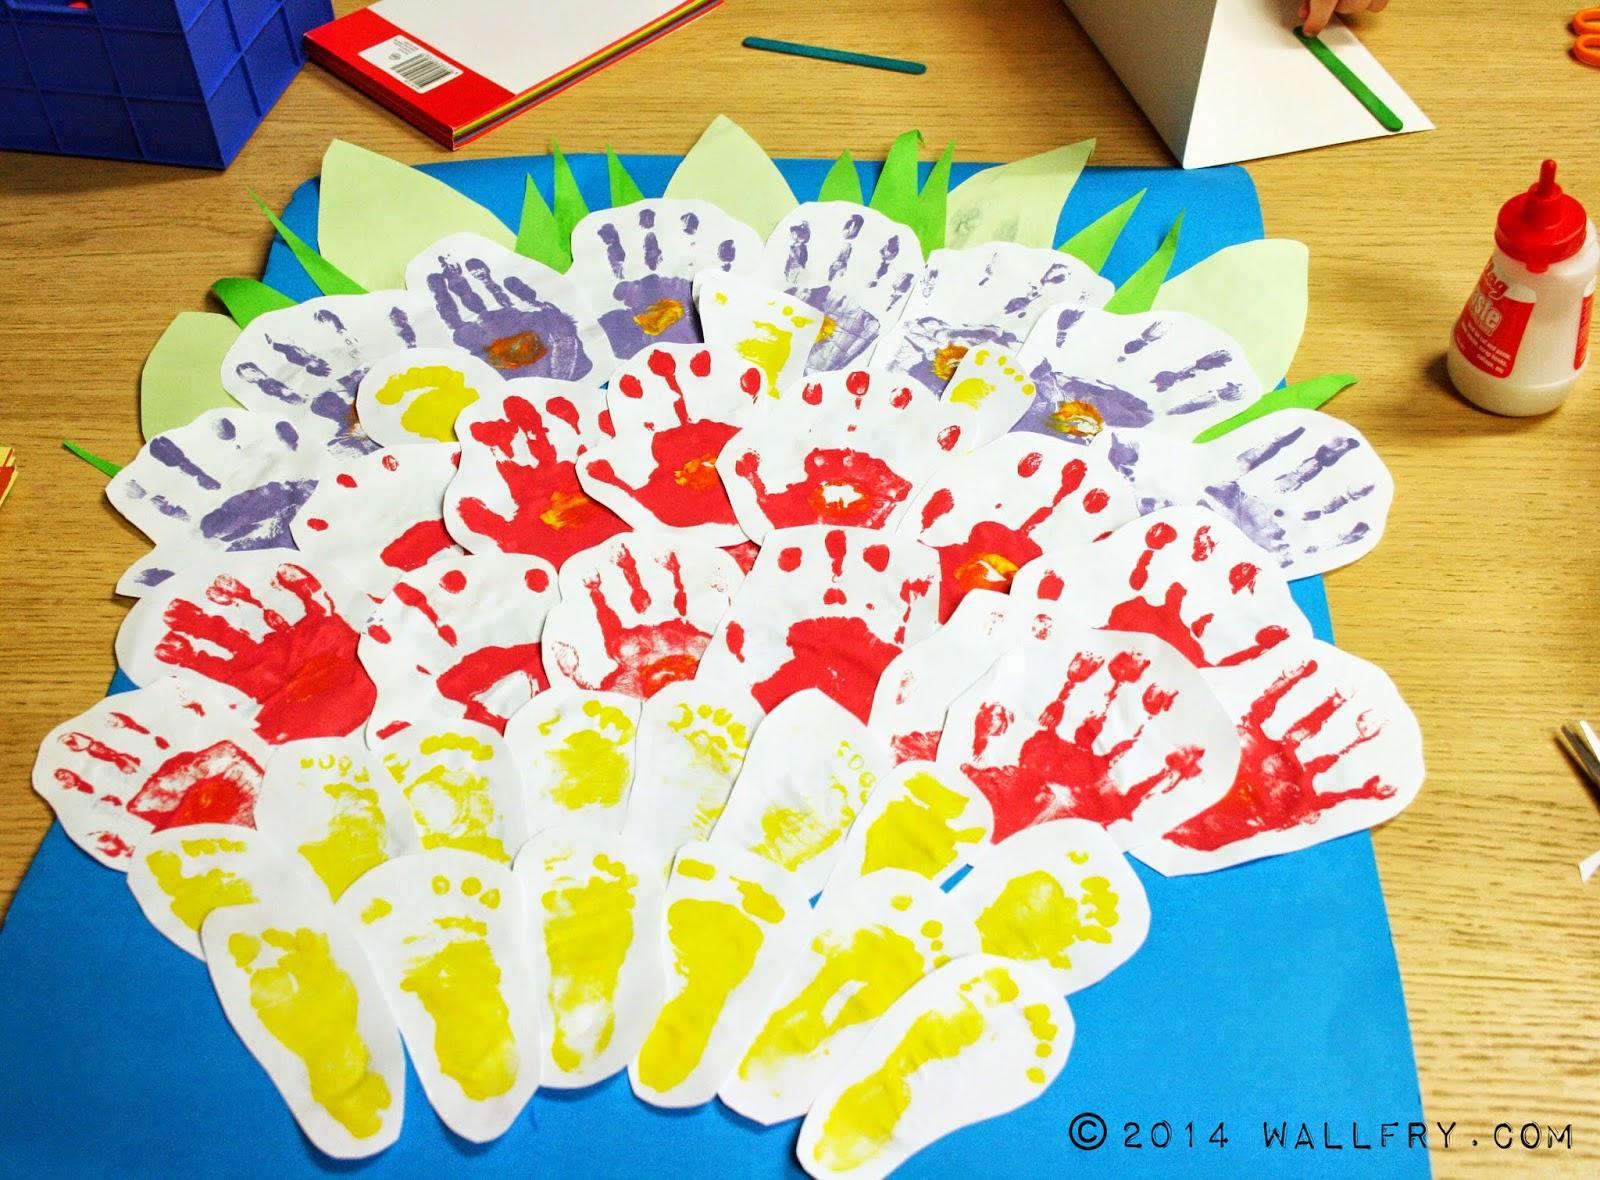 WallFry | Wall Art for Small Fry: Hand Print Bouquet - DIY Tutorial